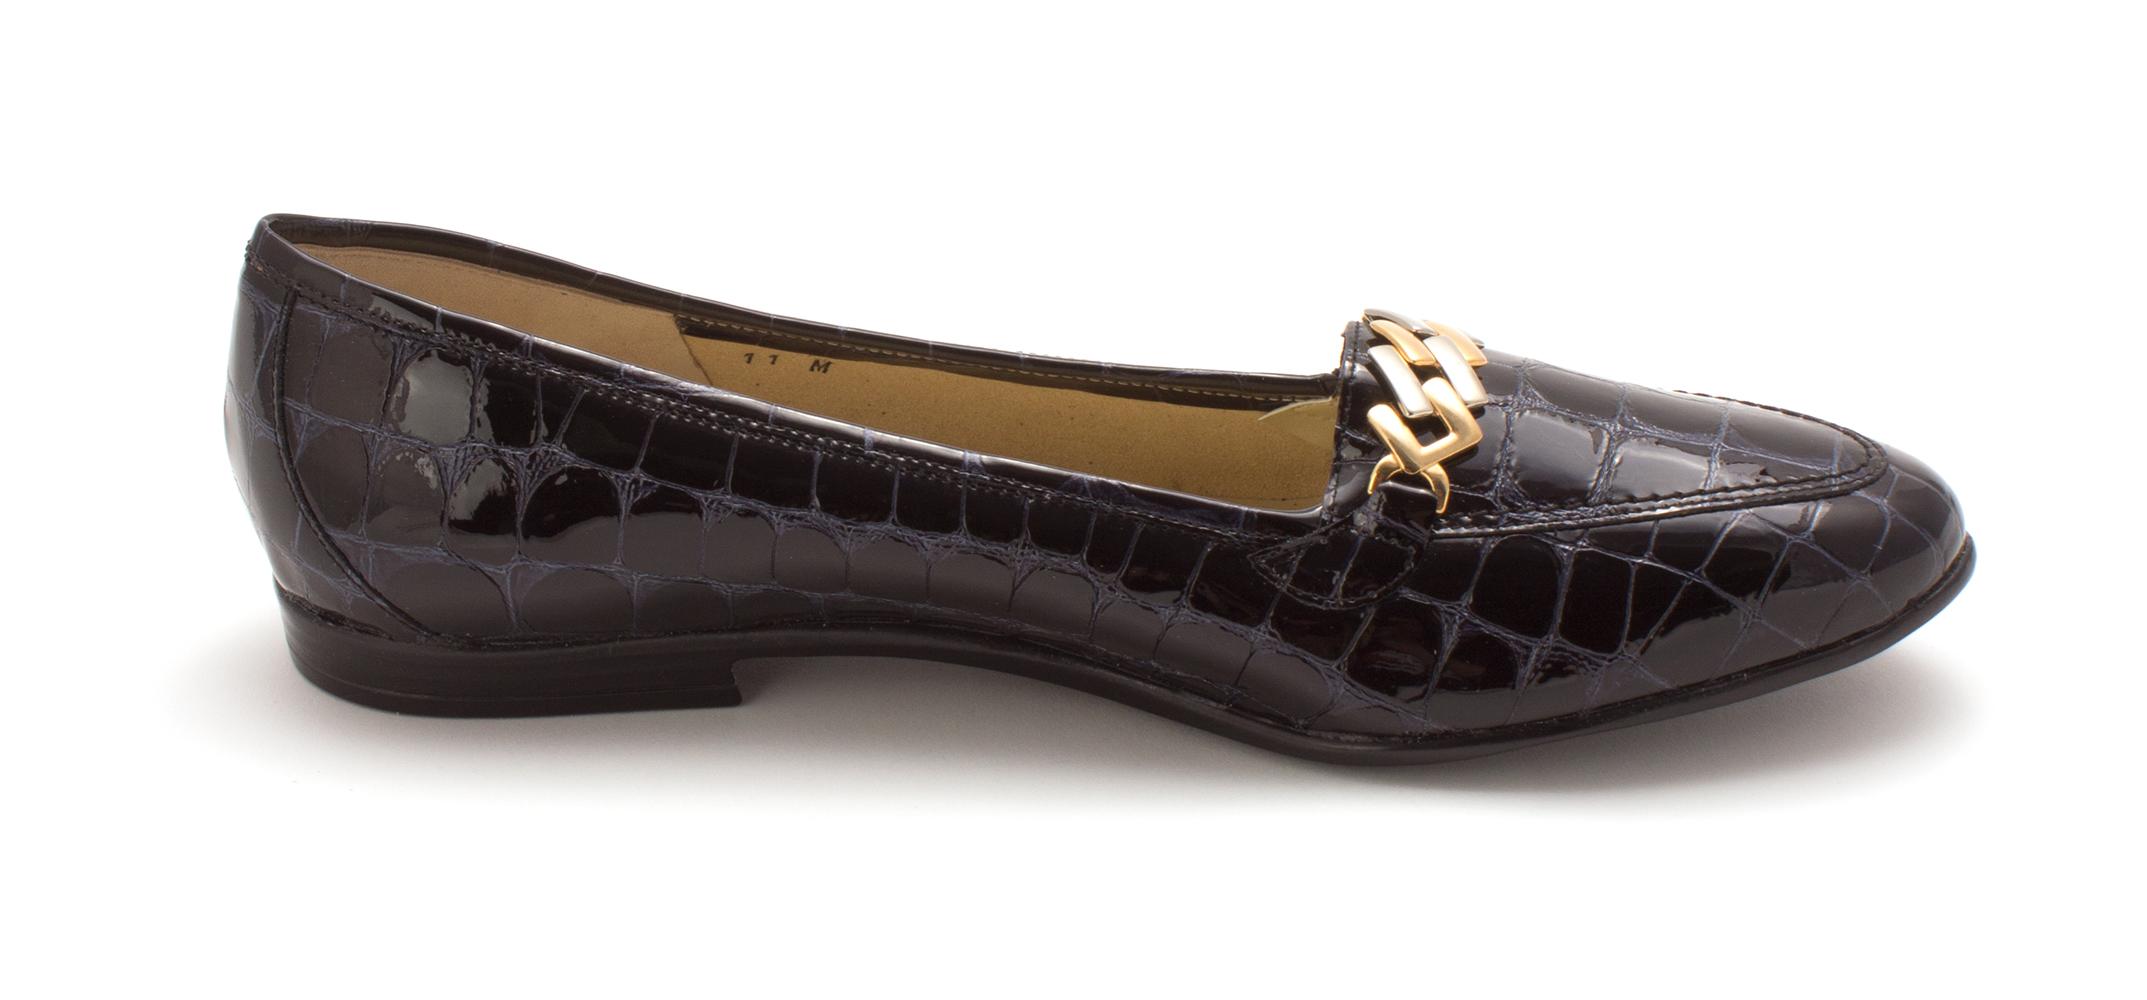 Amalfi by Rangoni damen Oste Almond Toe Loafers      172d76